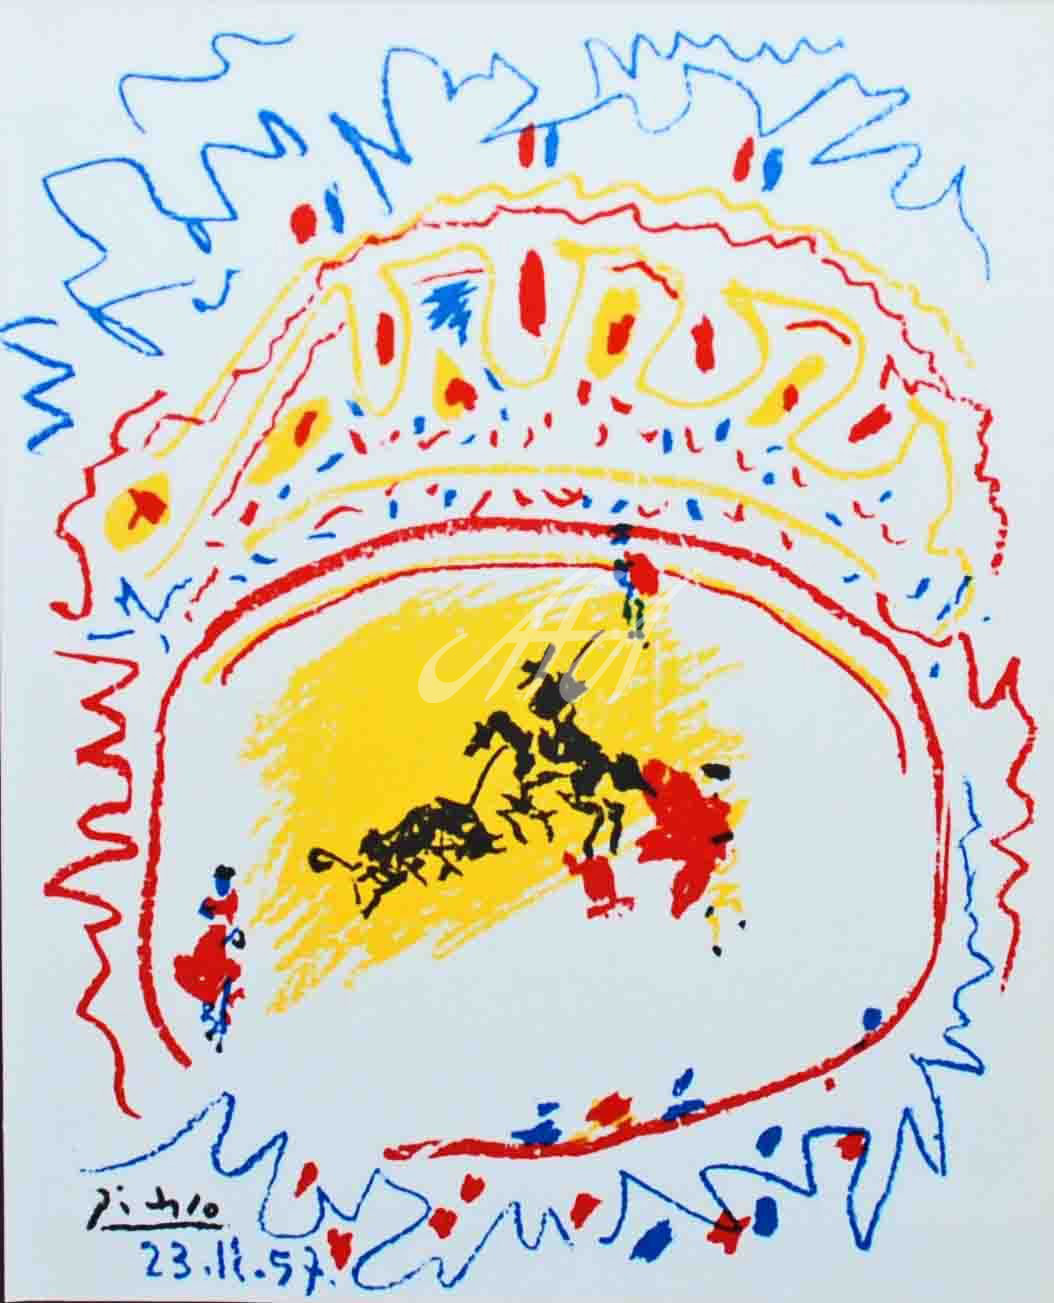 Picasso_La Petite Corrida watermark.jpg